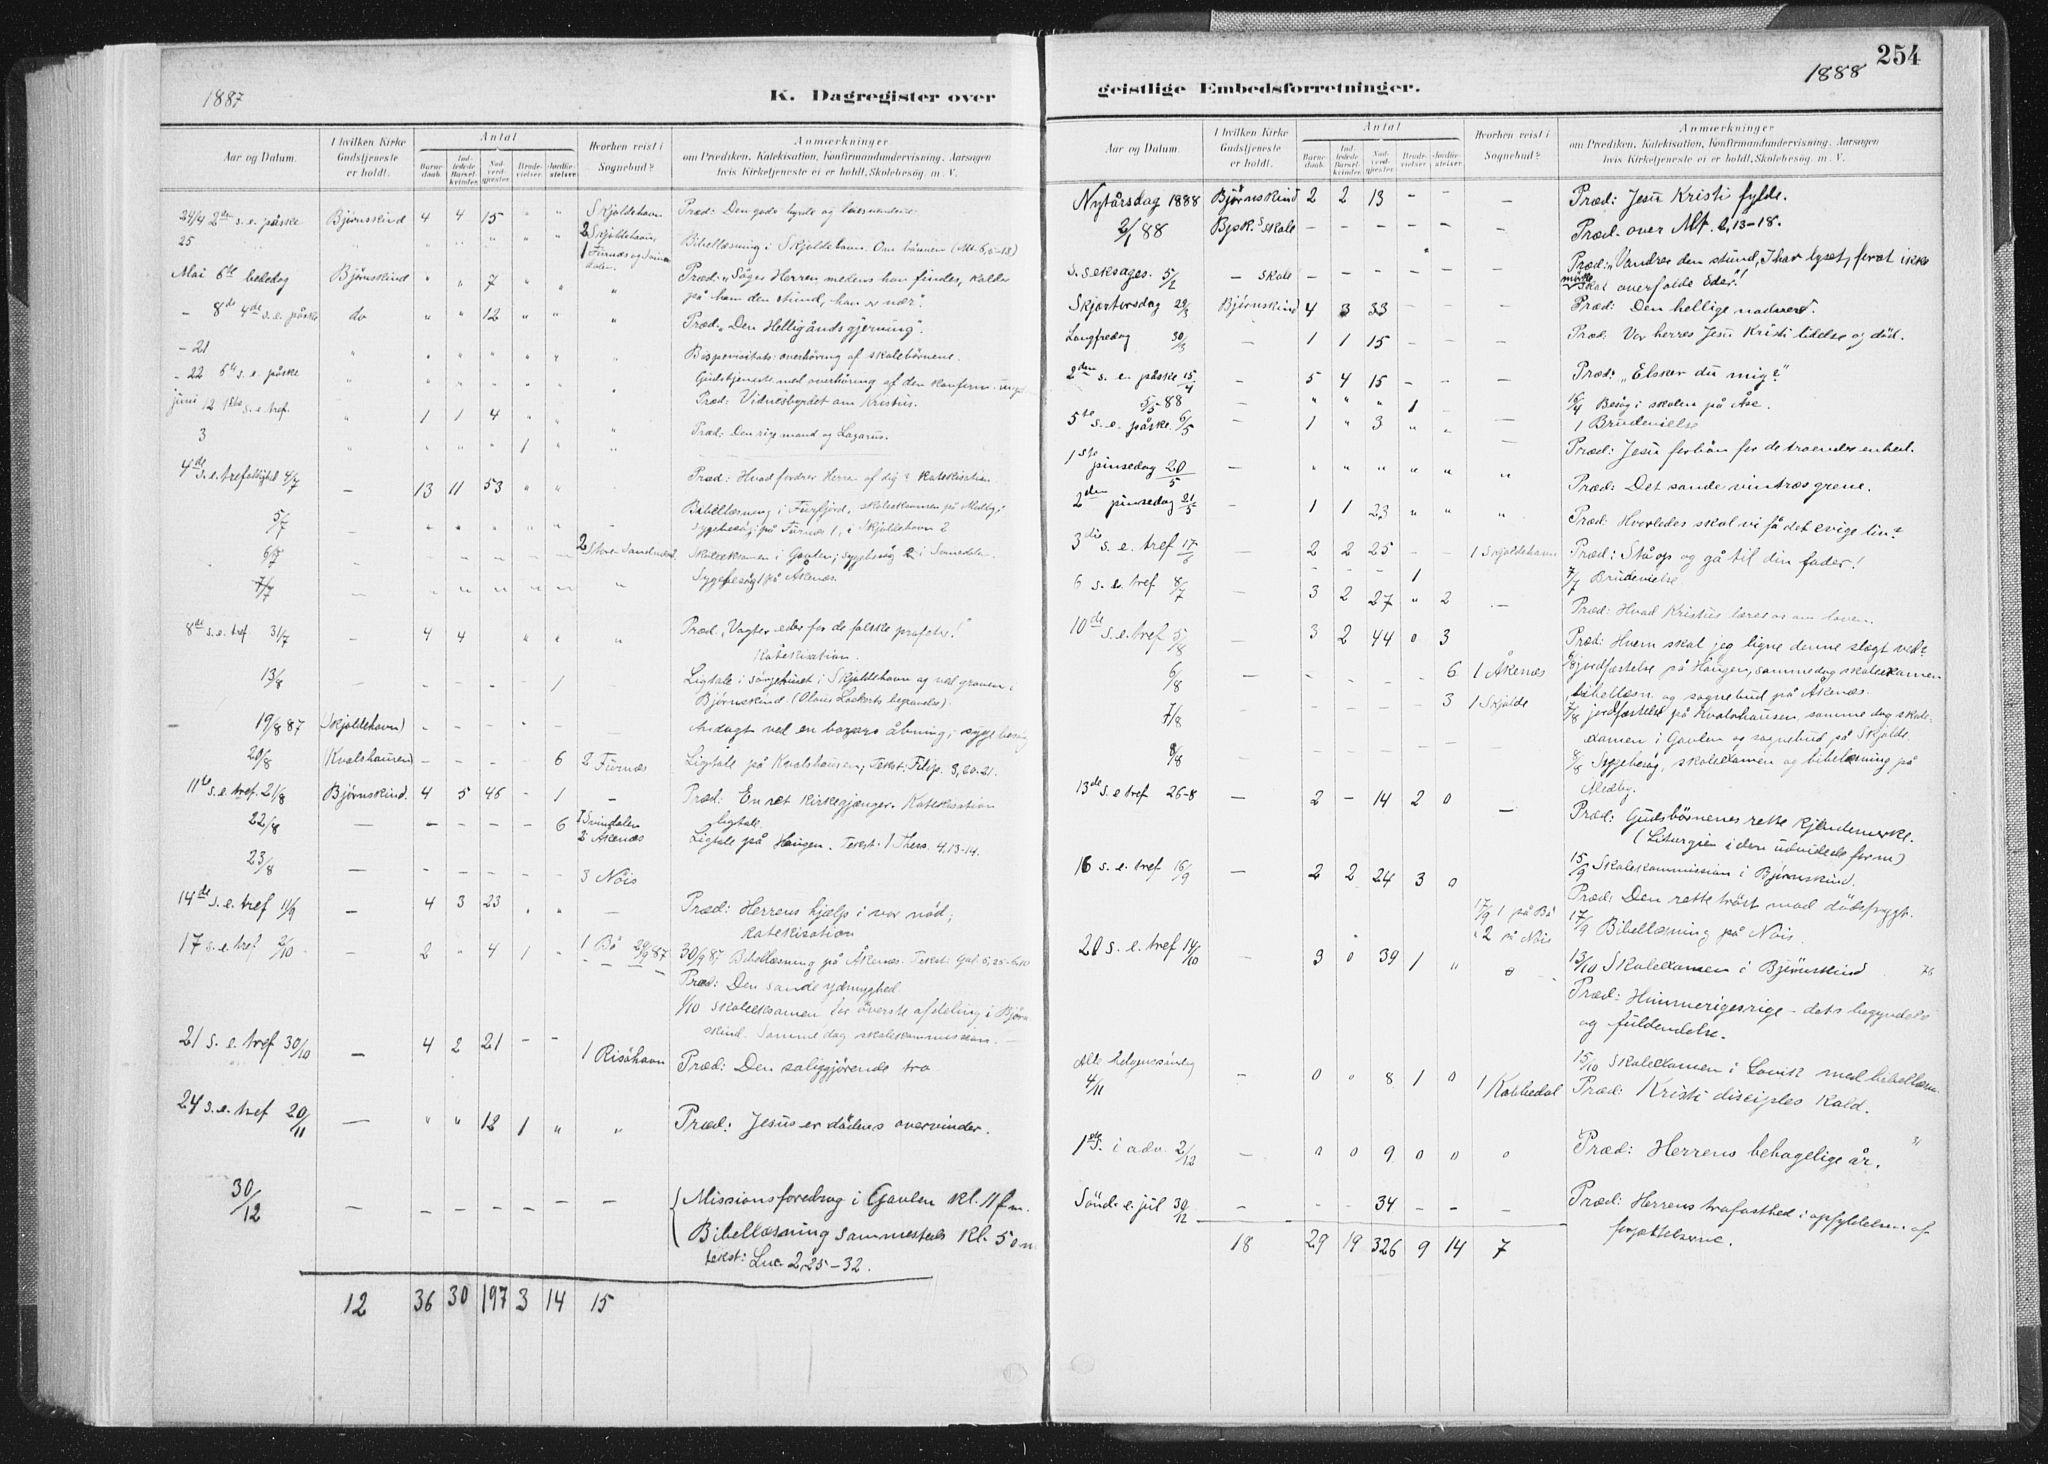 SAT, Ministerialprotokoller, klokkerbøker og fødselsregistre - Nordland, 898/L1422: Ministerialbok nr. 898A02, 1887-1908, s. 254